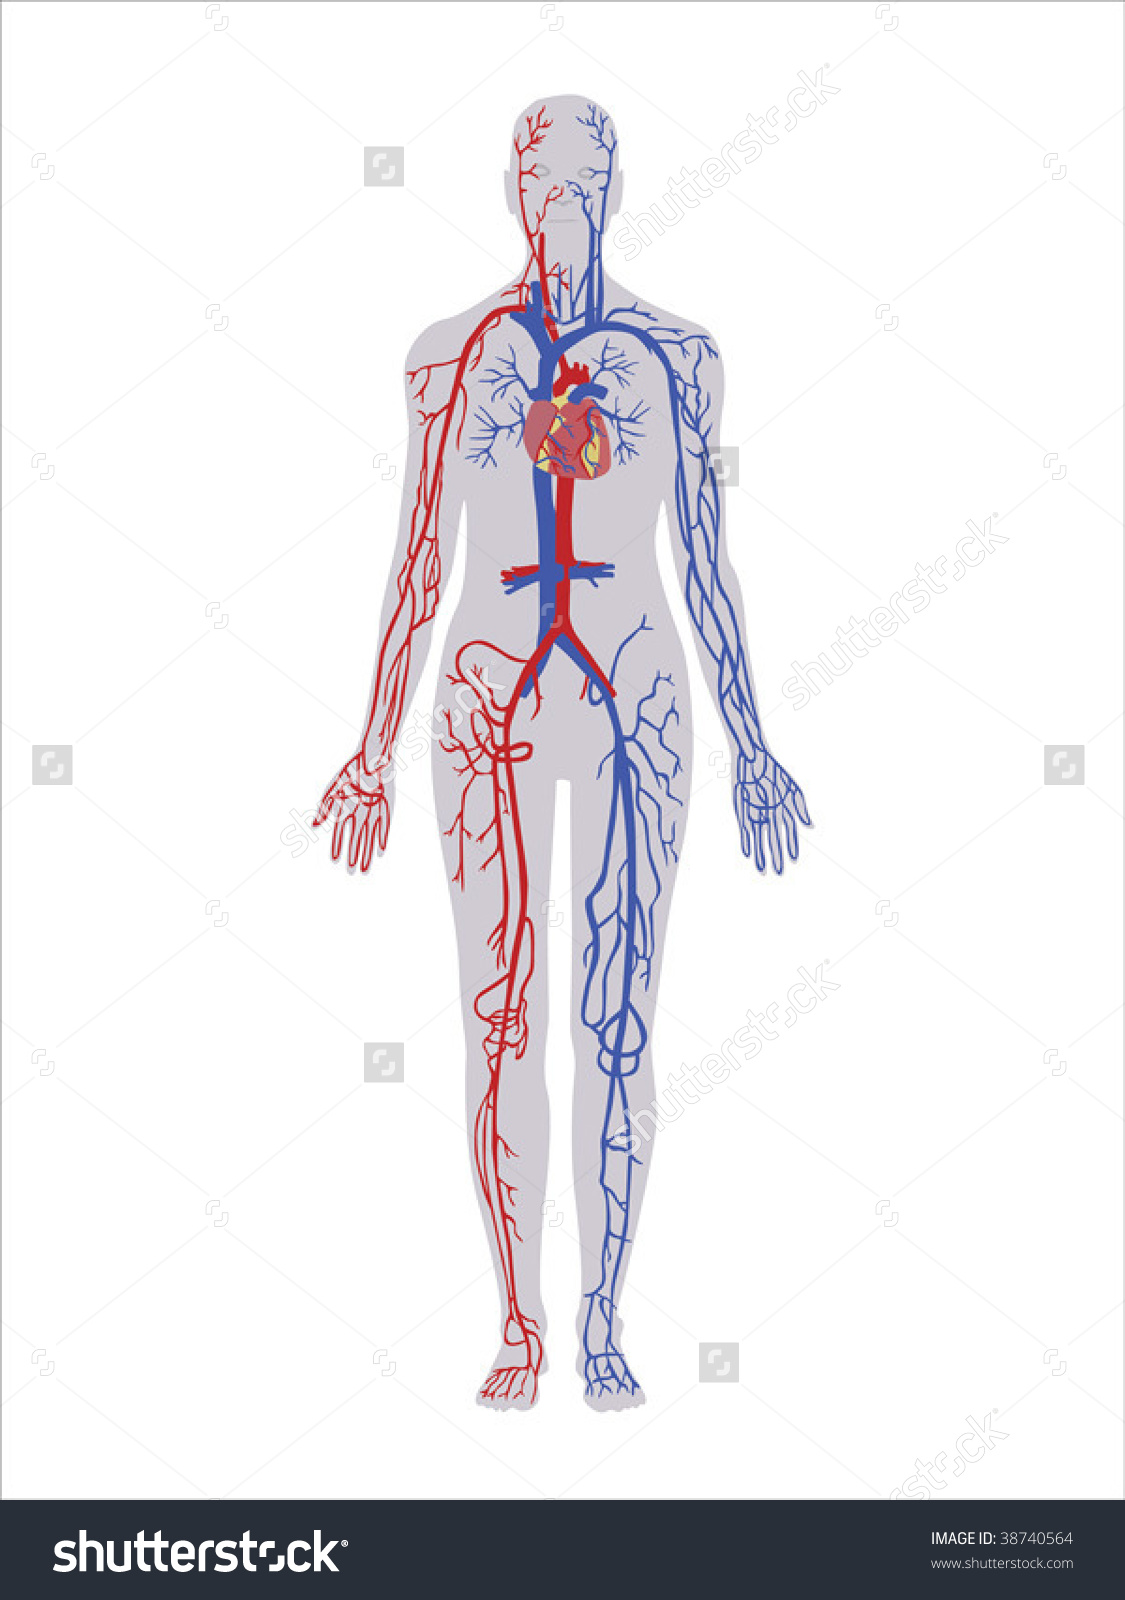 Human vein clipart - Clipground